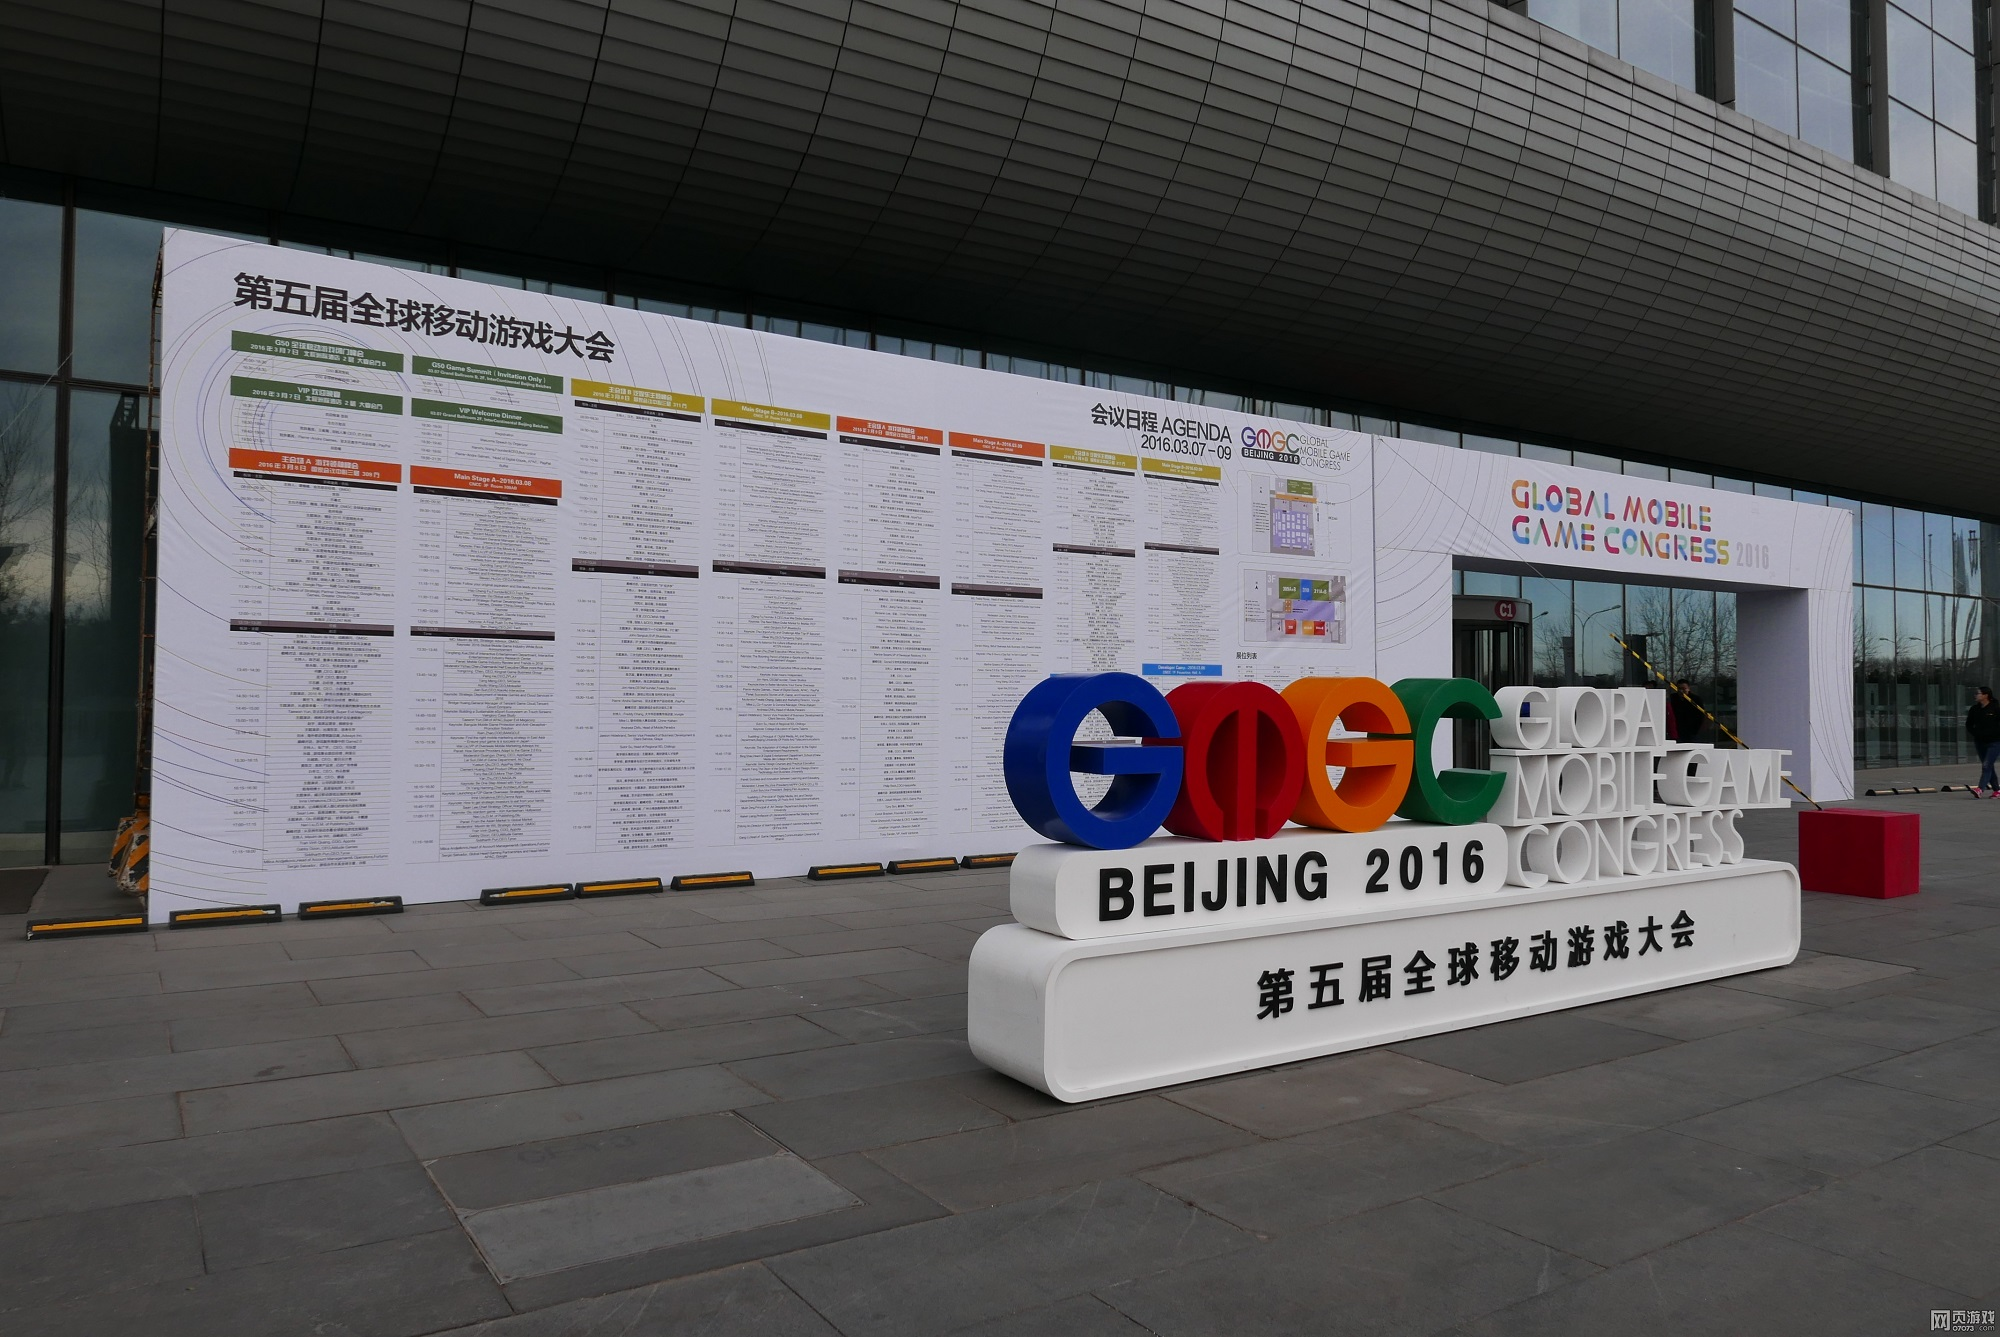 GMGC2016|维亚康姆国际传媒集团大中华区高级副总裁兼总经理张国礼:维亚康姆国际传媒数字媒体IP及市场拓展